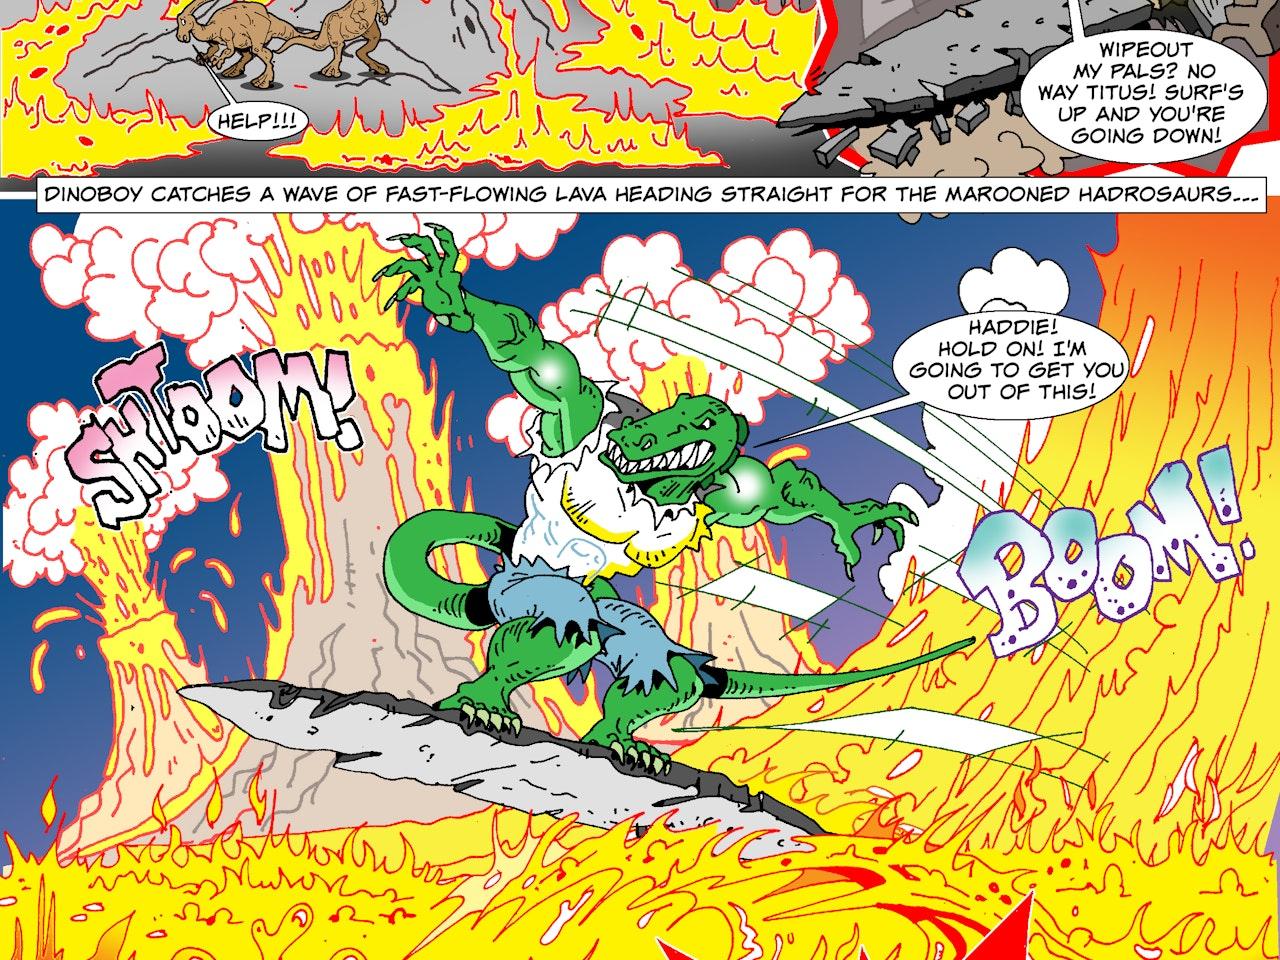 illustration animation  funny humorous comical colourful graphic cartoon manga anime publishing dinosaur prehistoric action fantasy adventure storyboard